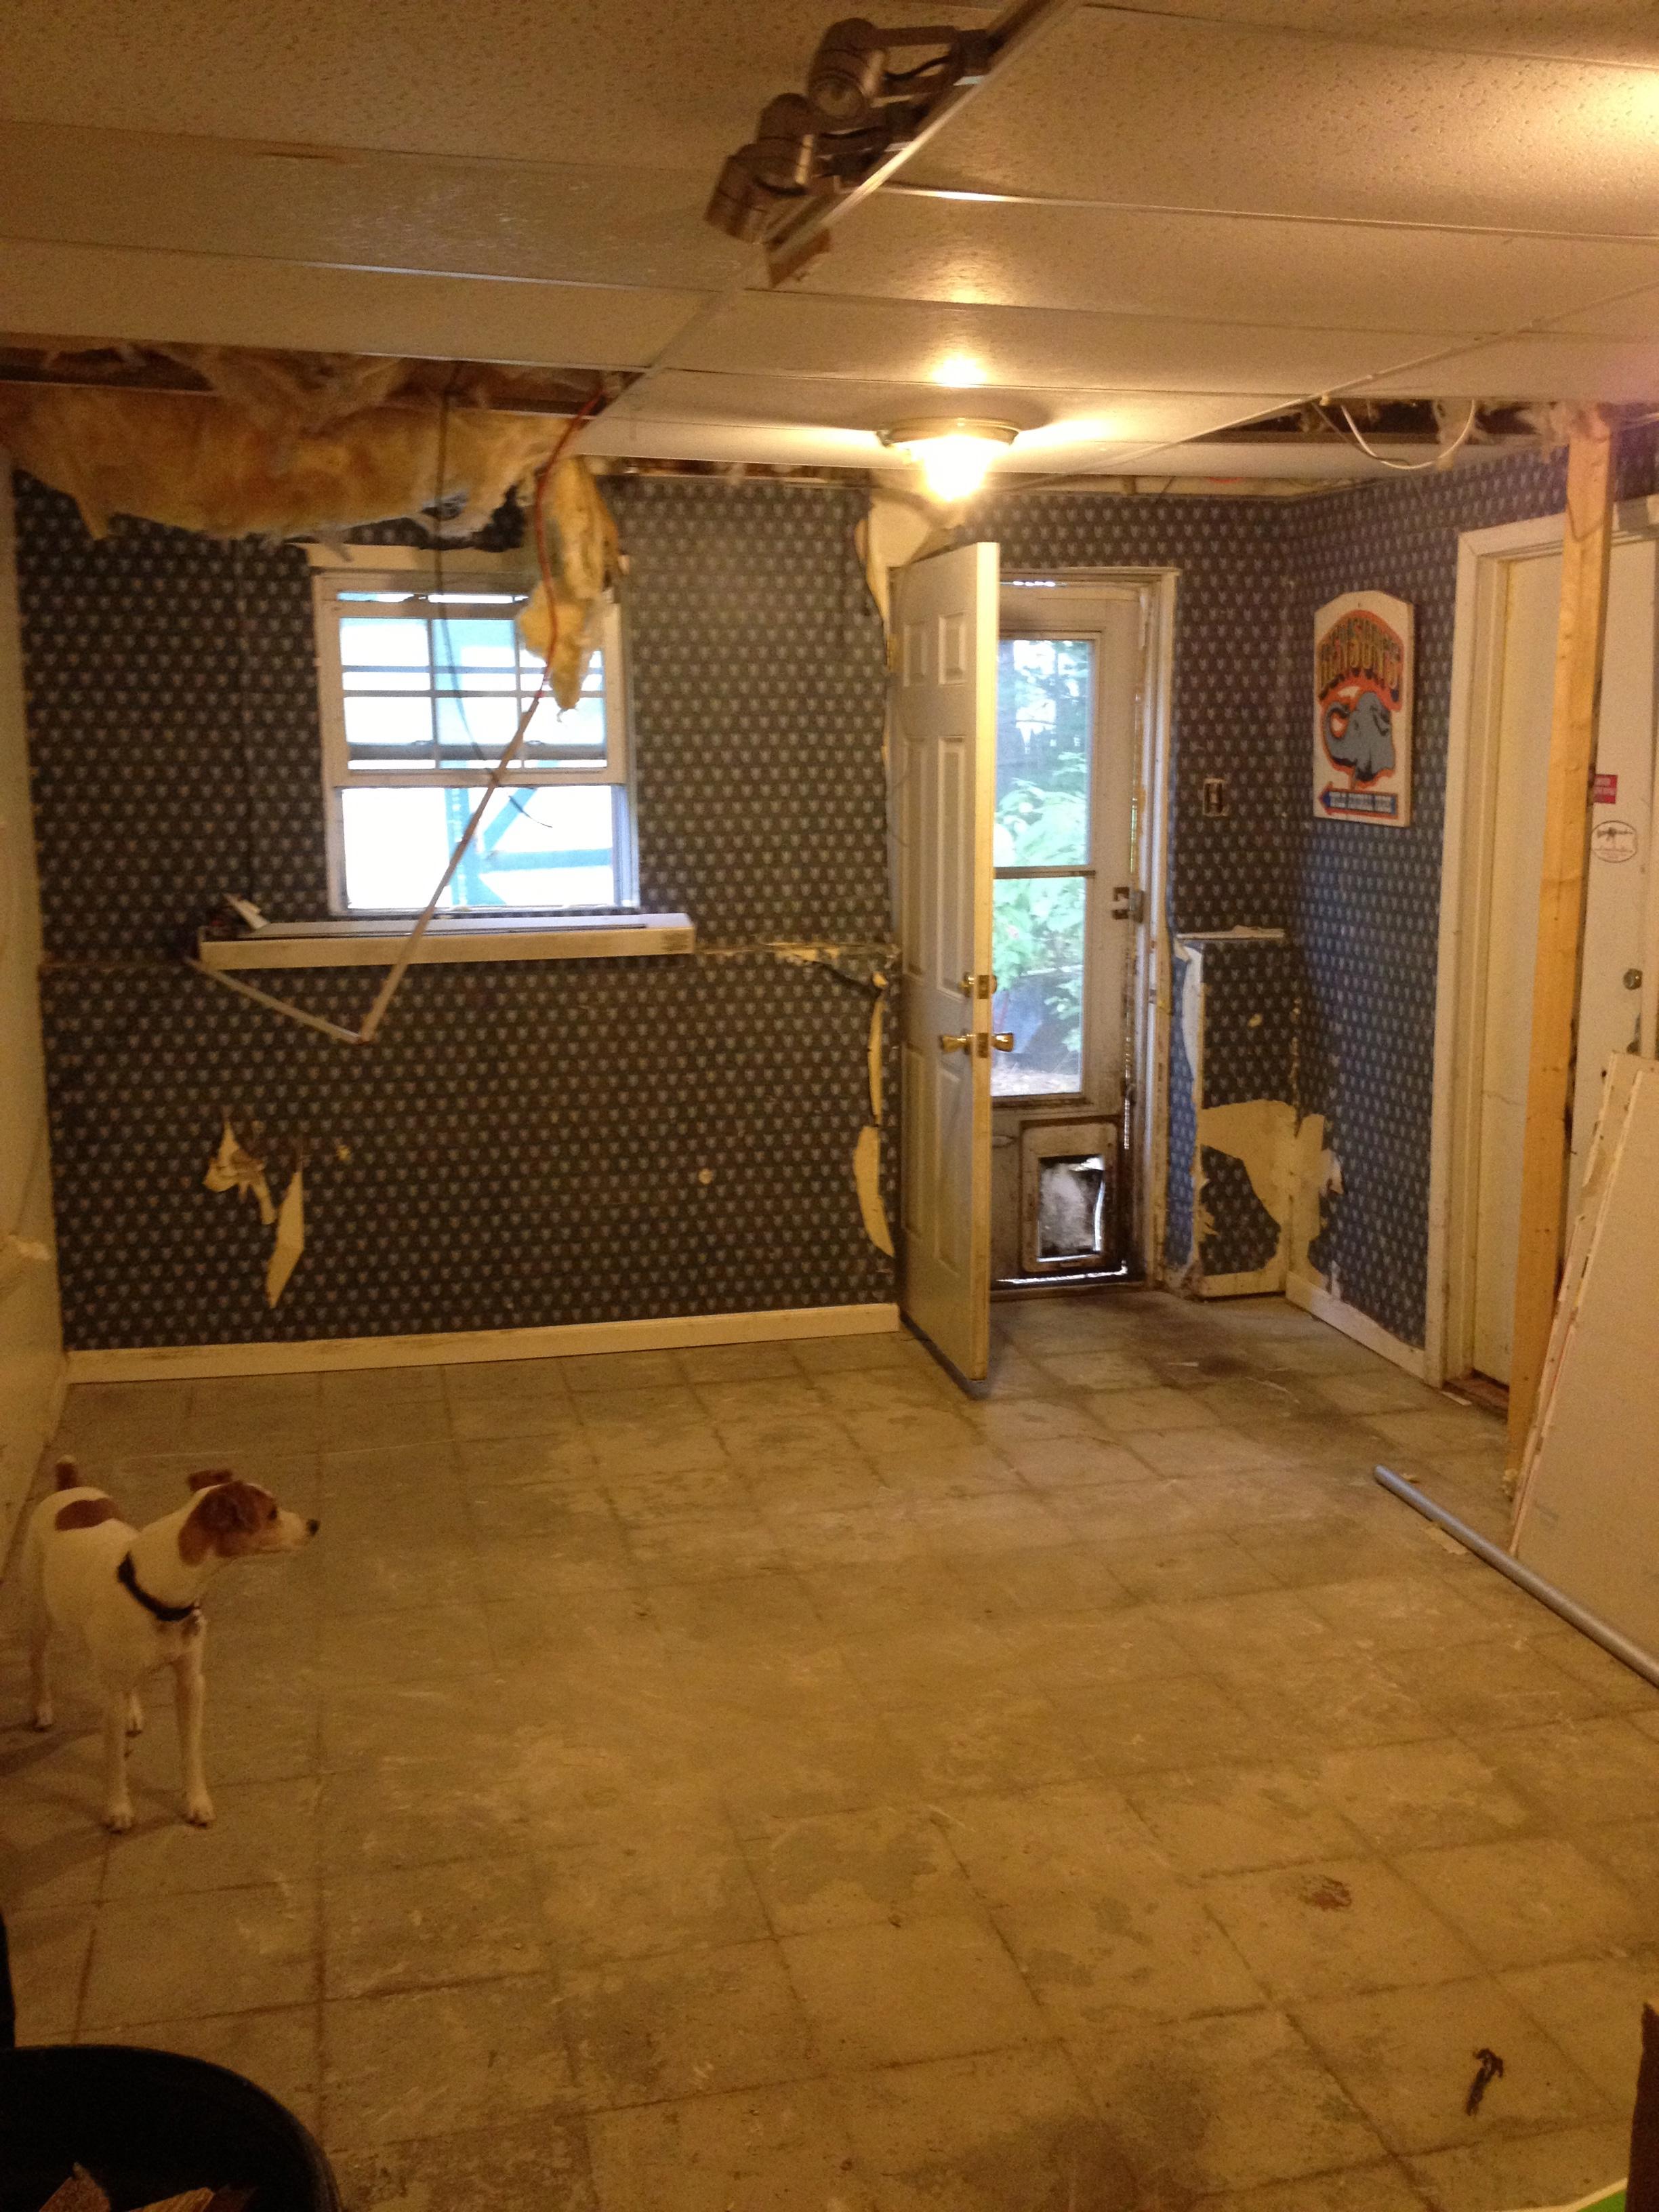 Building A Secure Gun Room Crypticpunk Krip Tik Puhngk